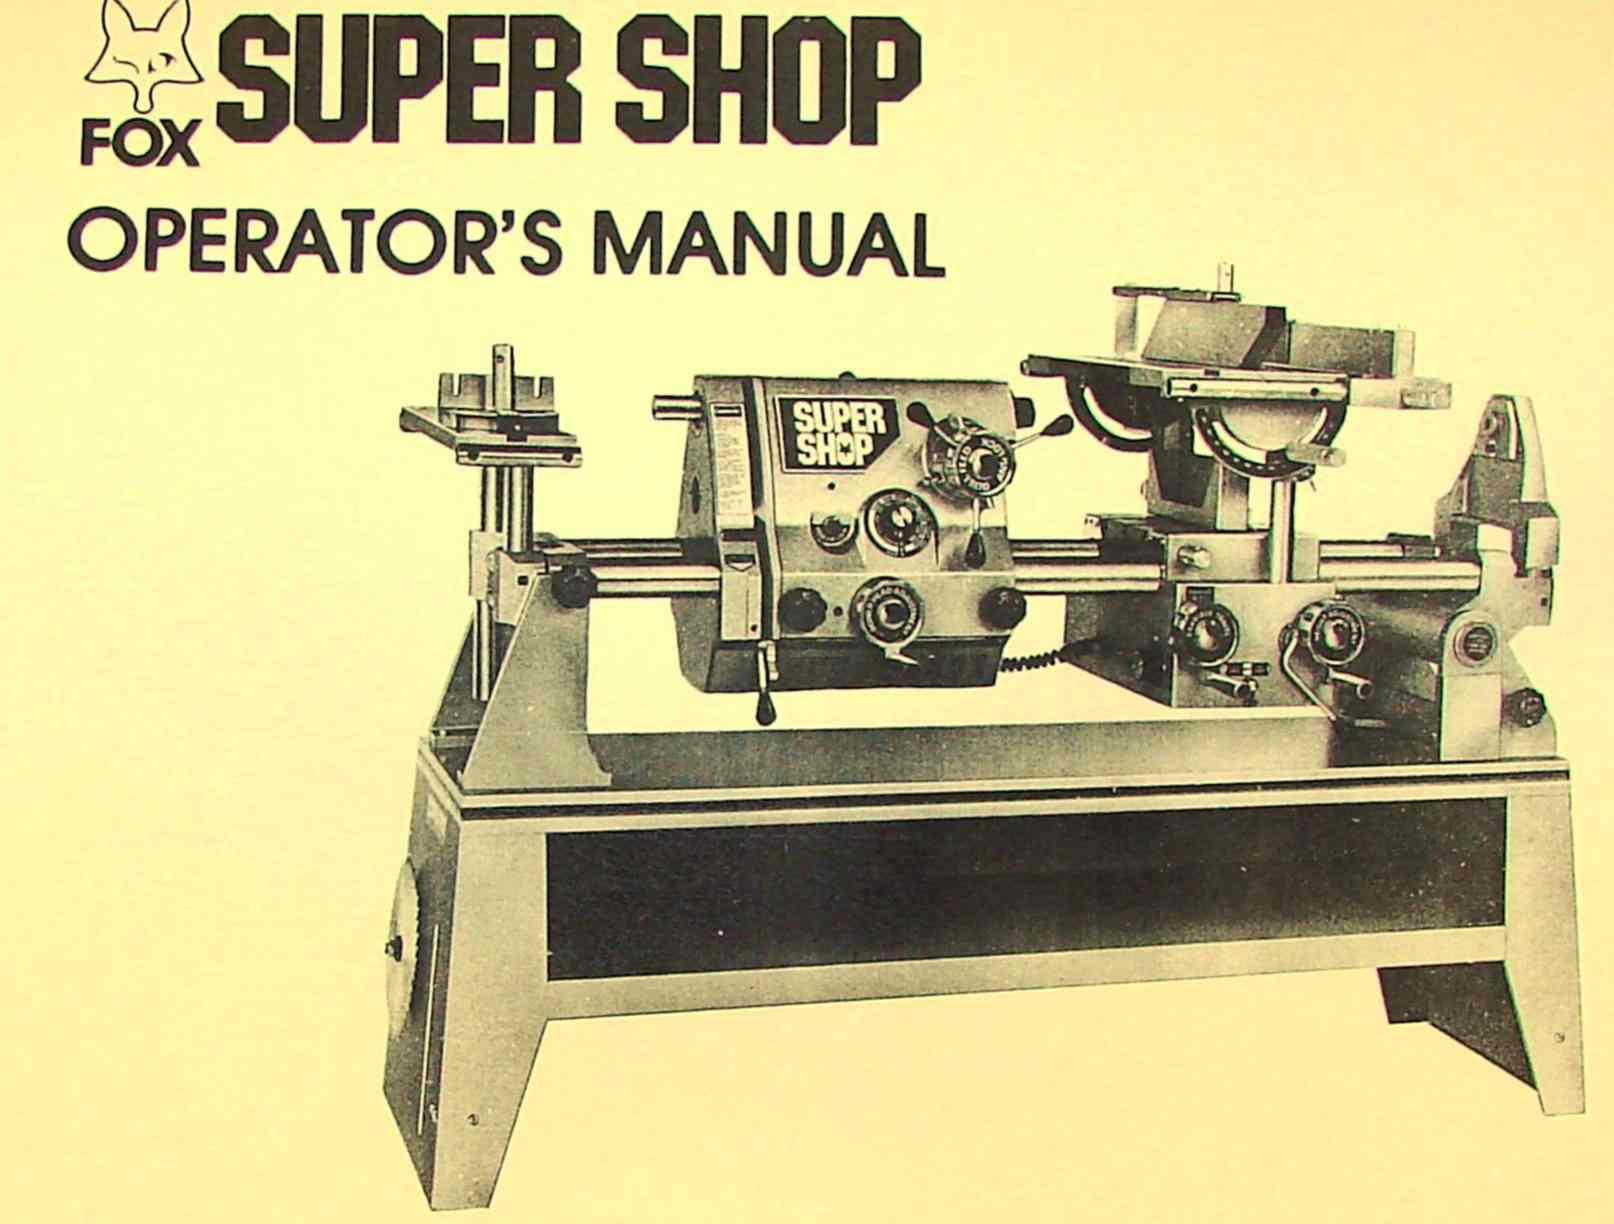 FOX SuperShop Multi-Purpose Lathe Operator Part Manual | Ozark Tool Manuals  & Books